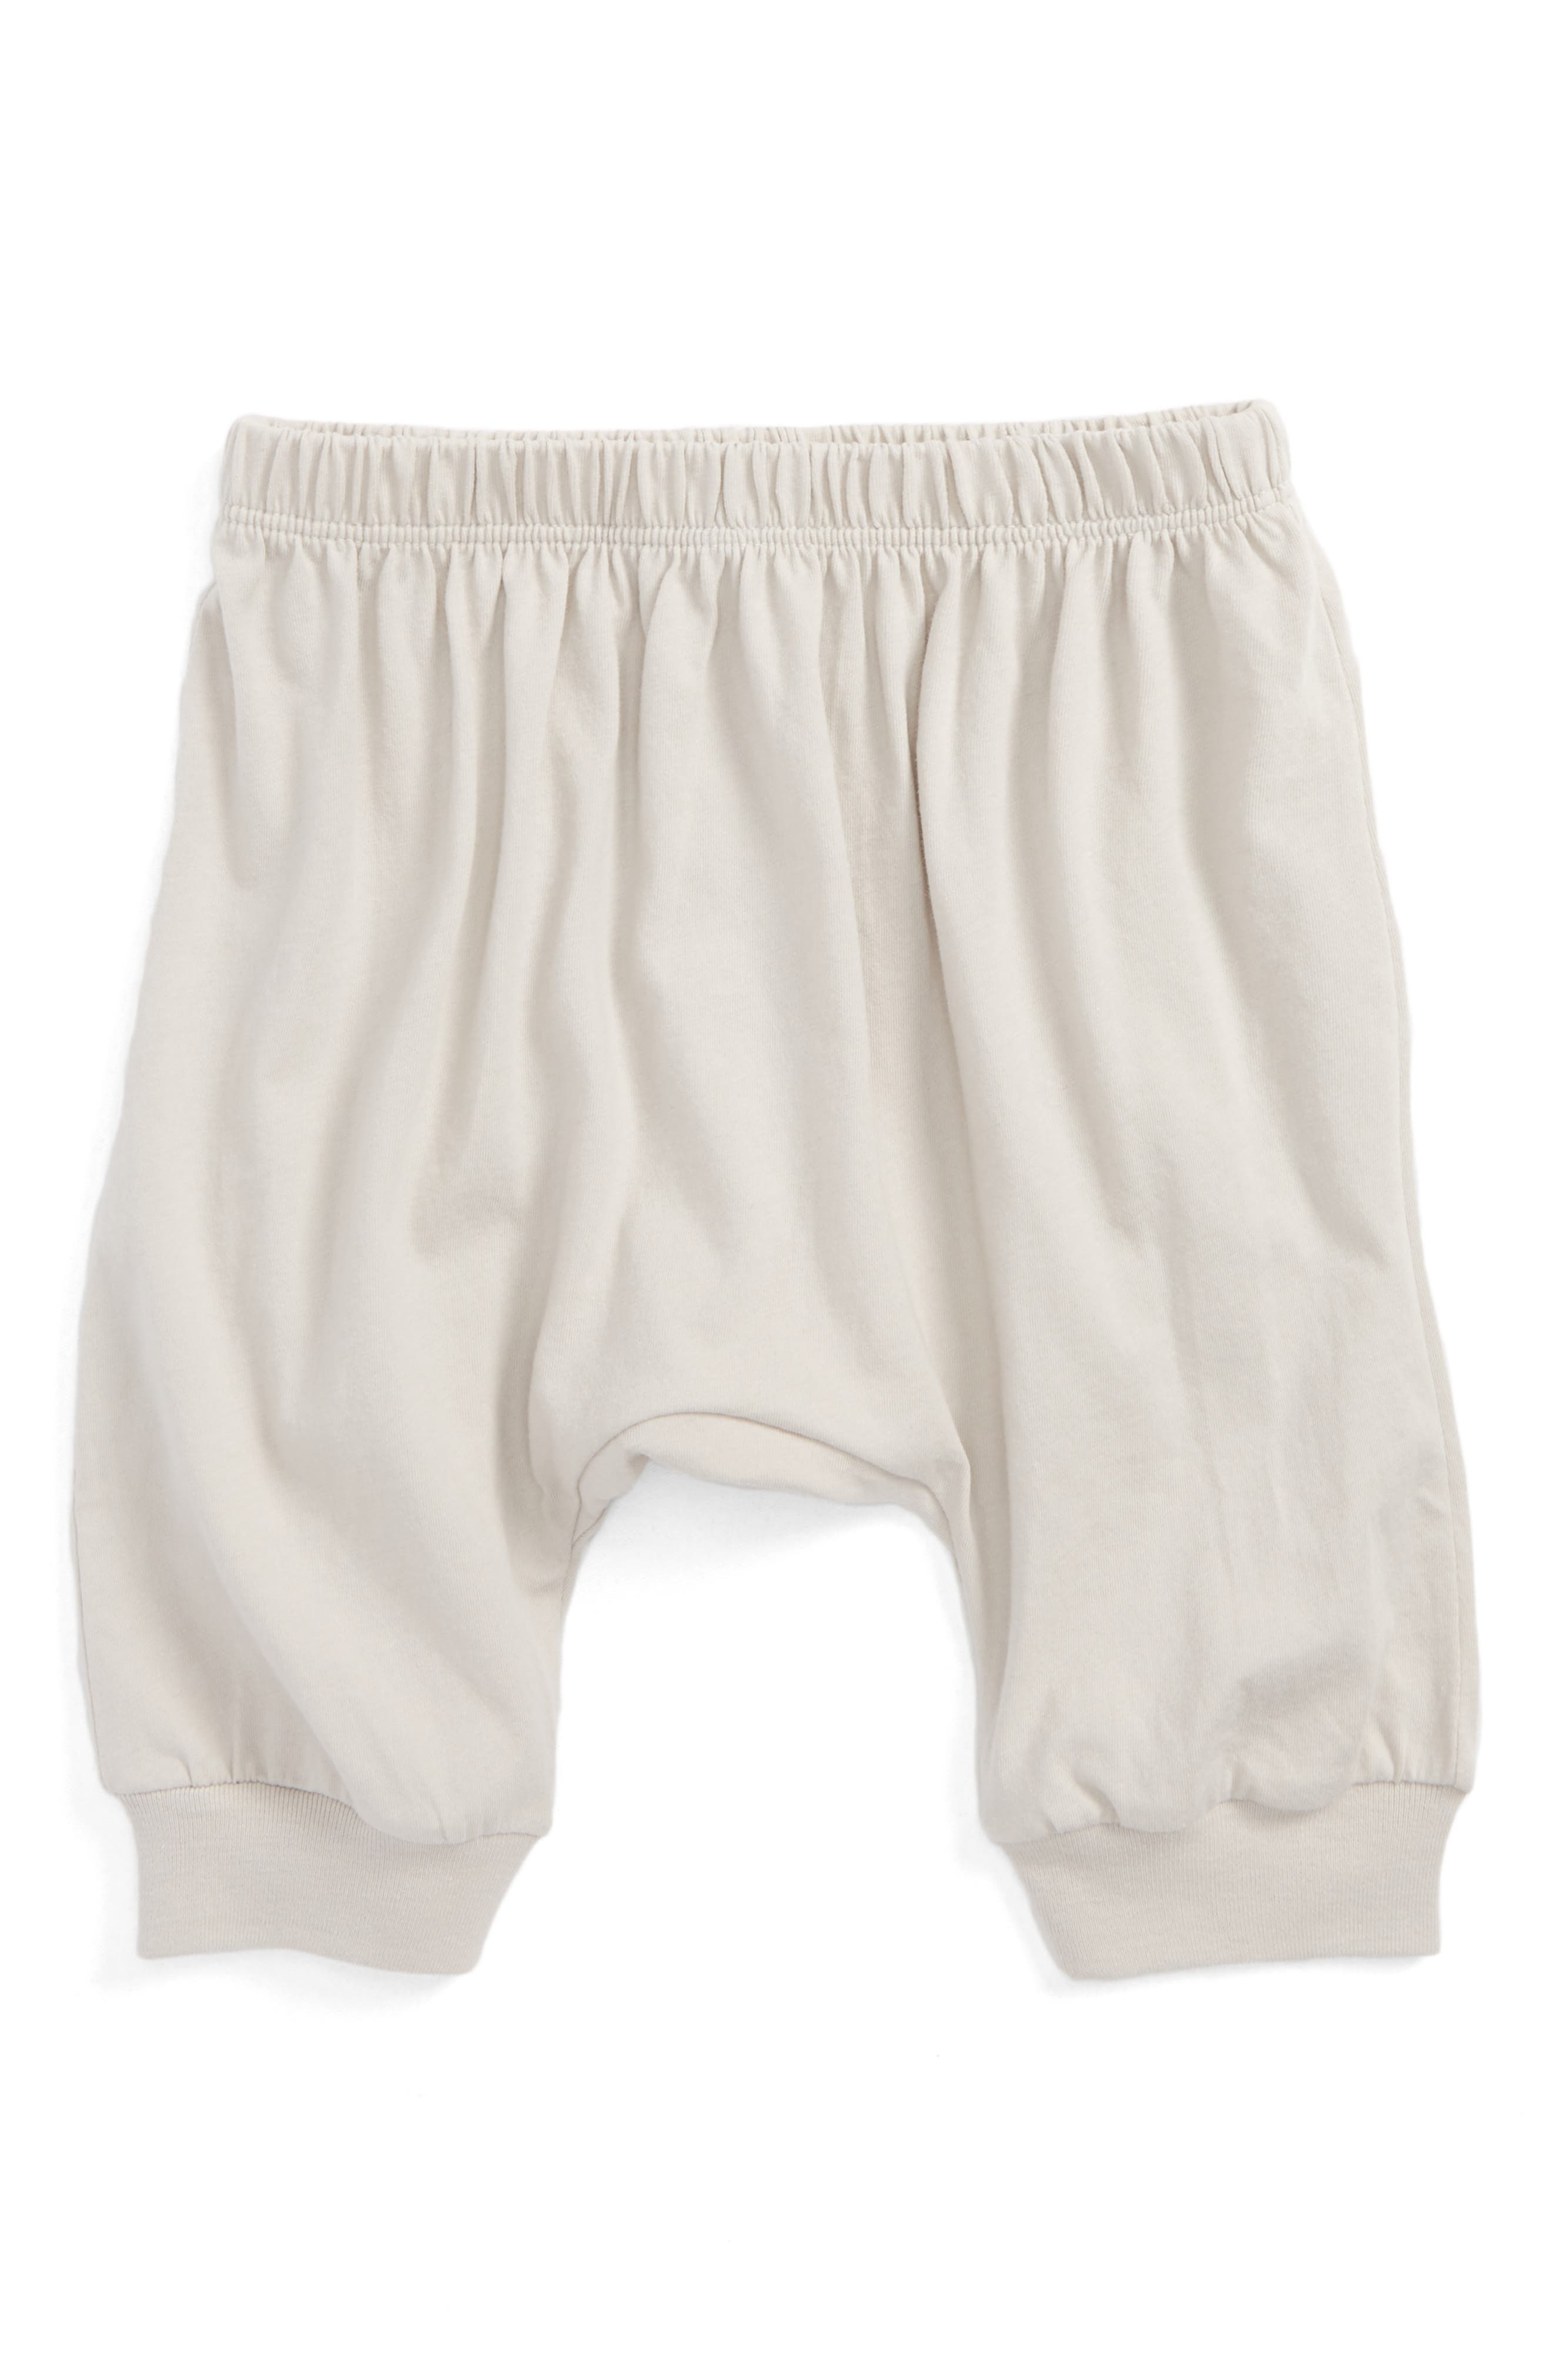 Peek Little Peanut Jogger Pants,                         Main,                         color, 263